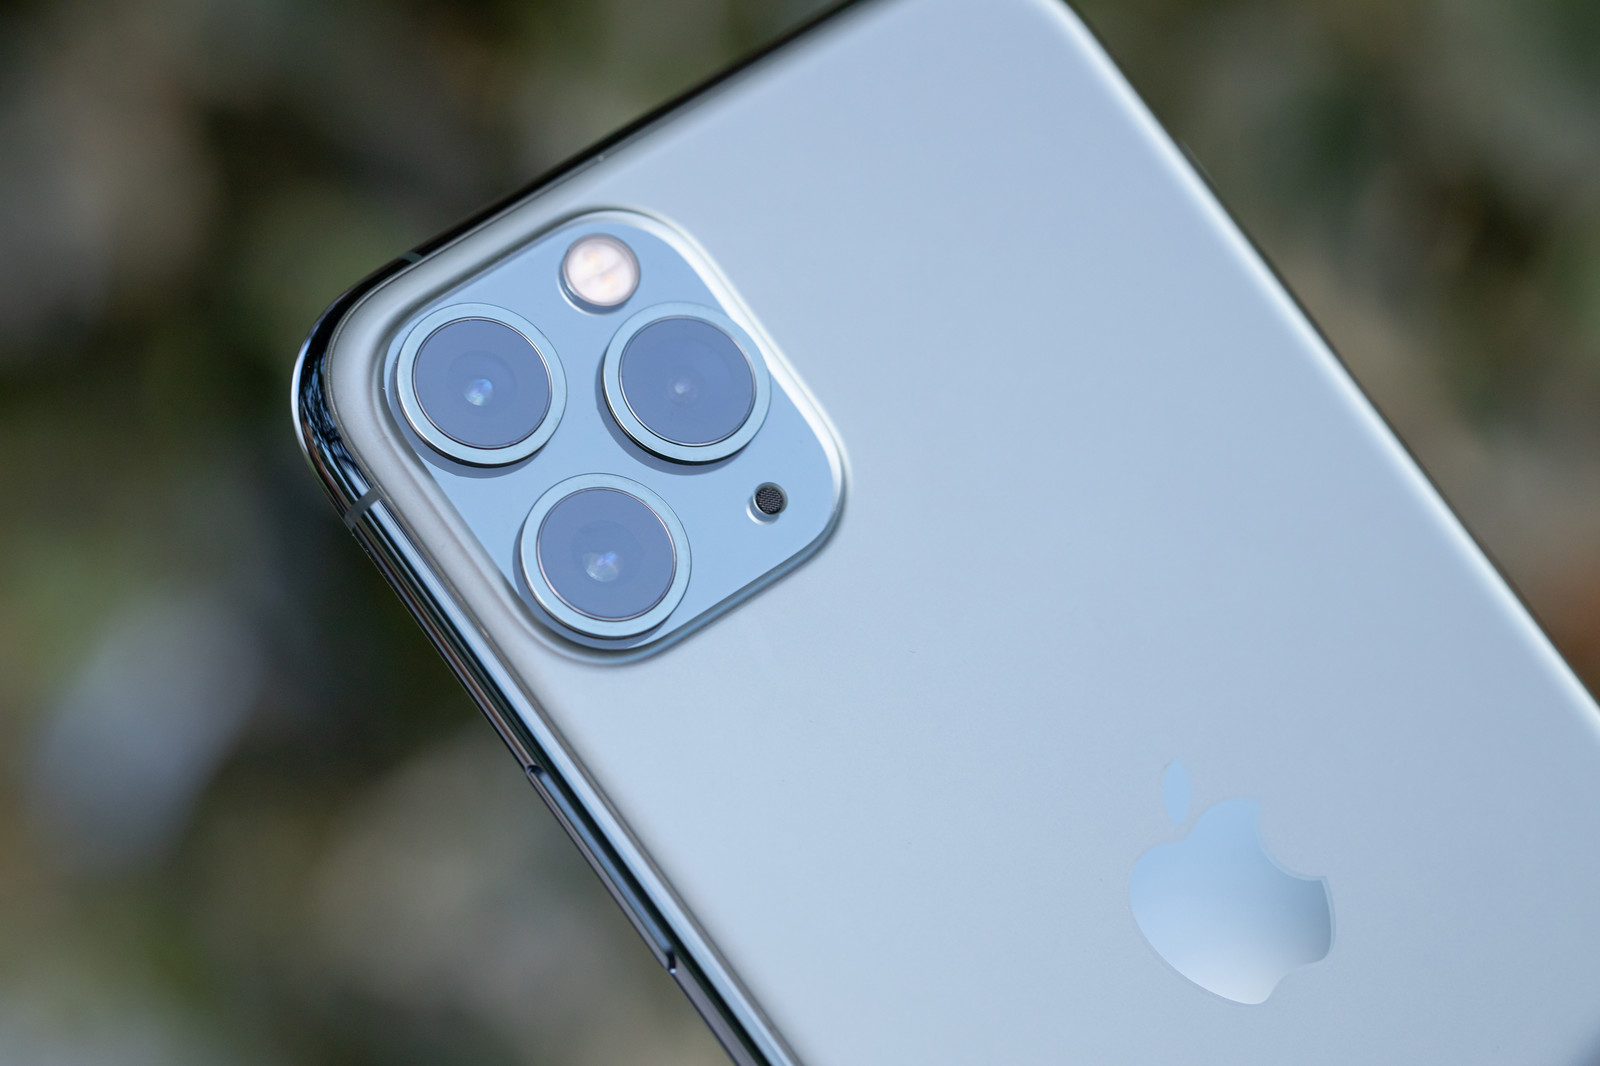 「iPhone11 のトリプルカメラ部分」の写真